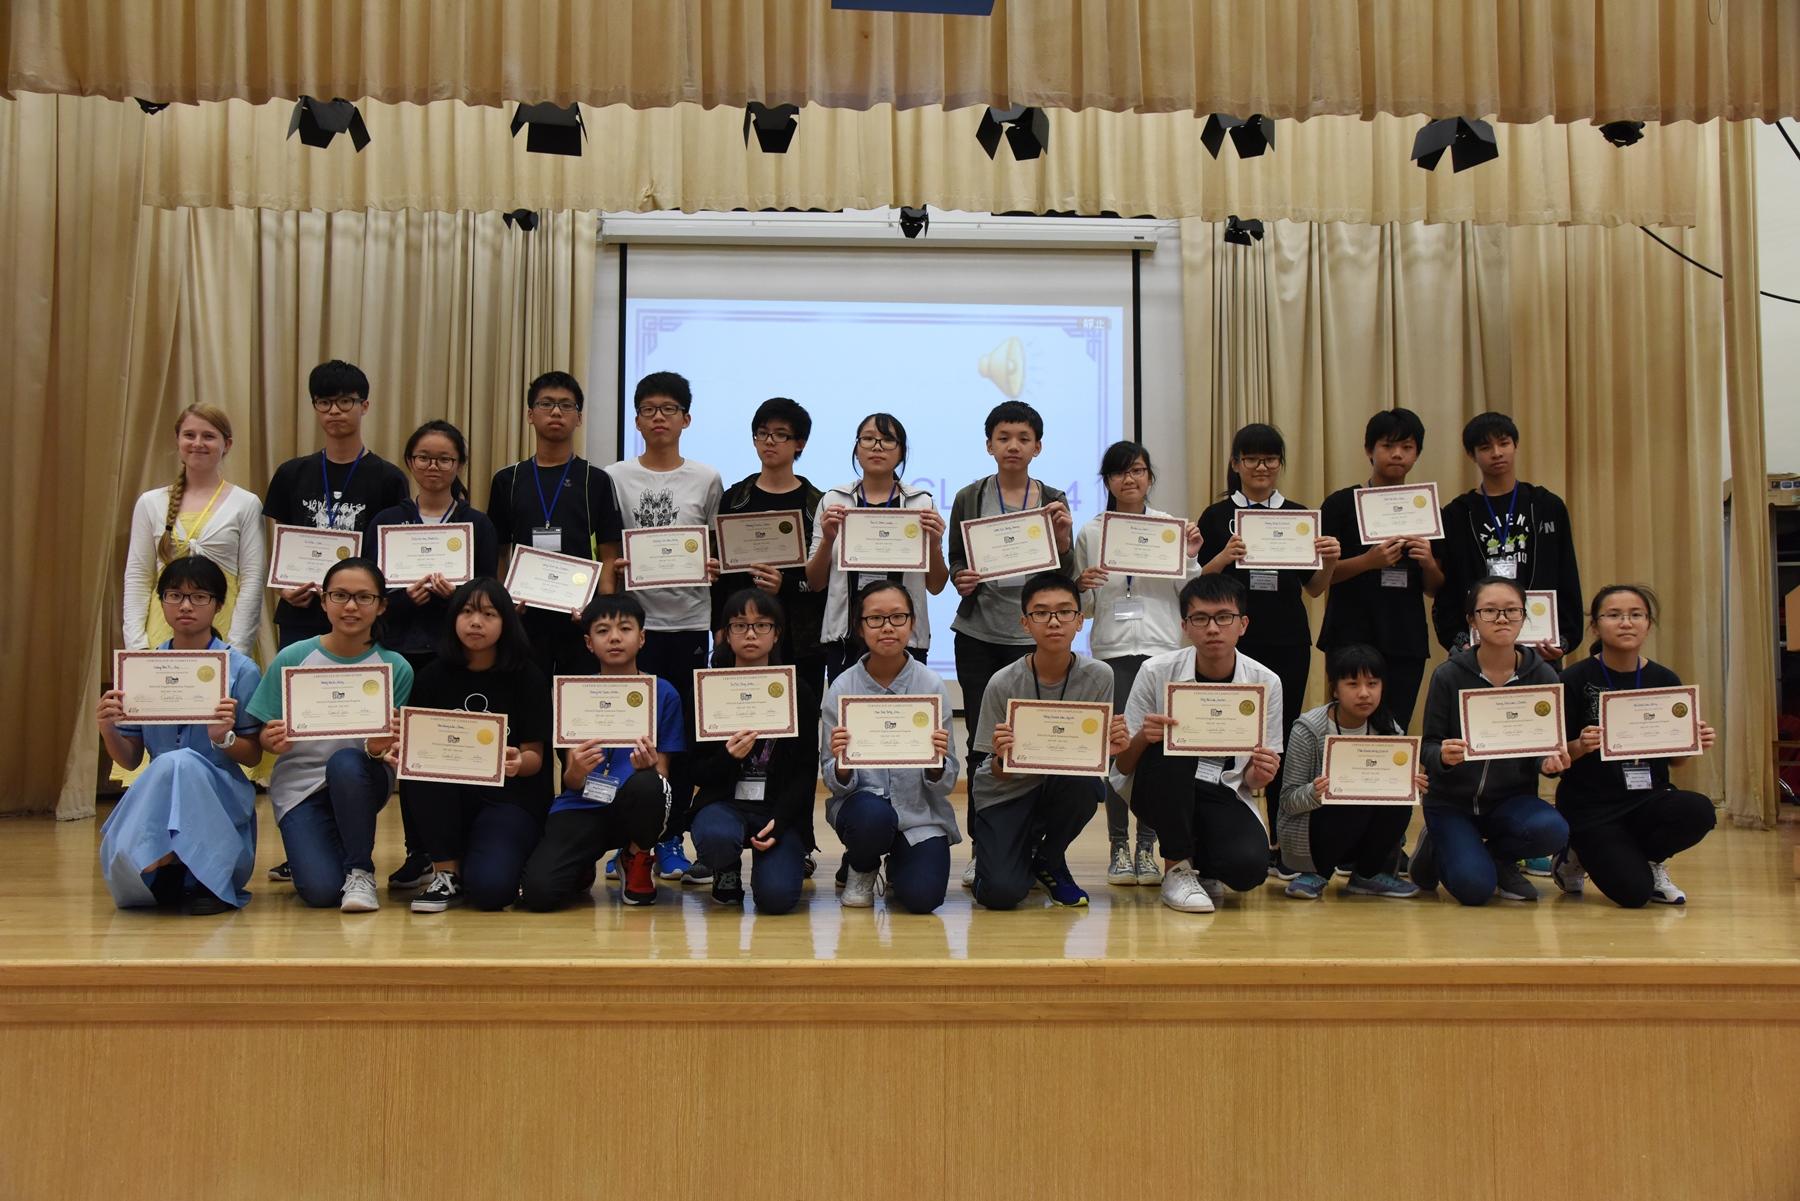 http://www.npc.edu.hk/sites/default/files/dsc_0281.jpg